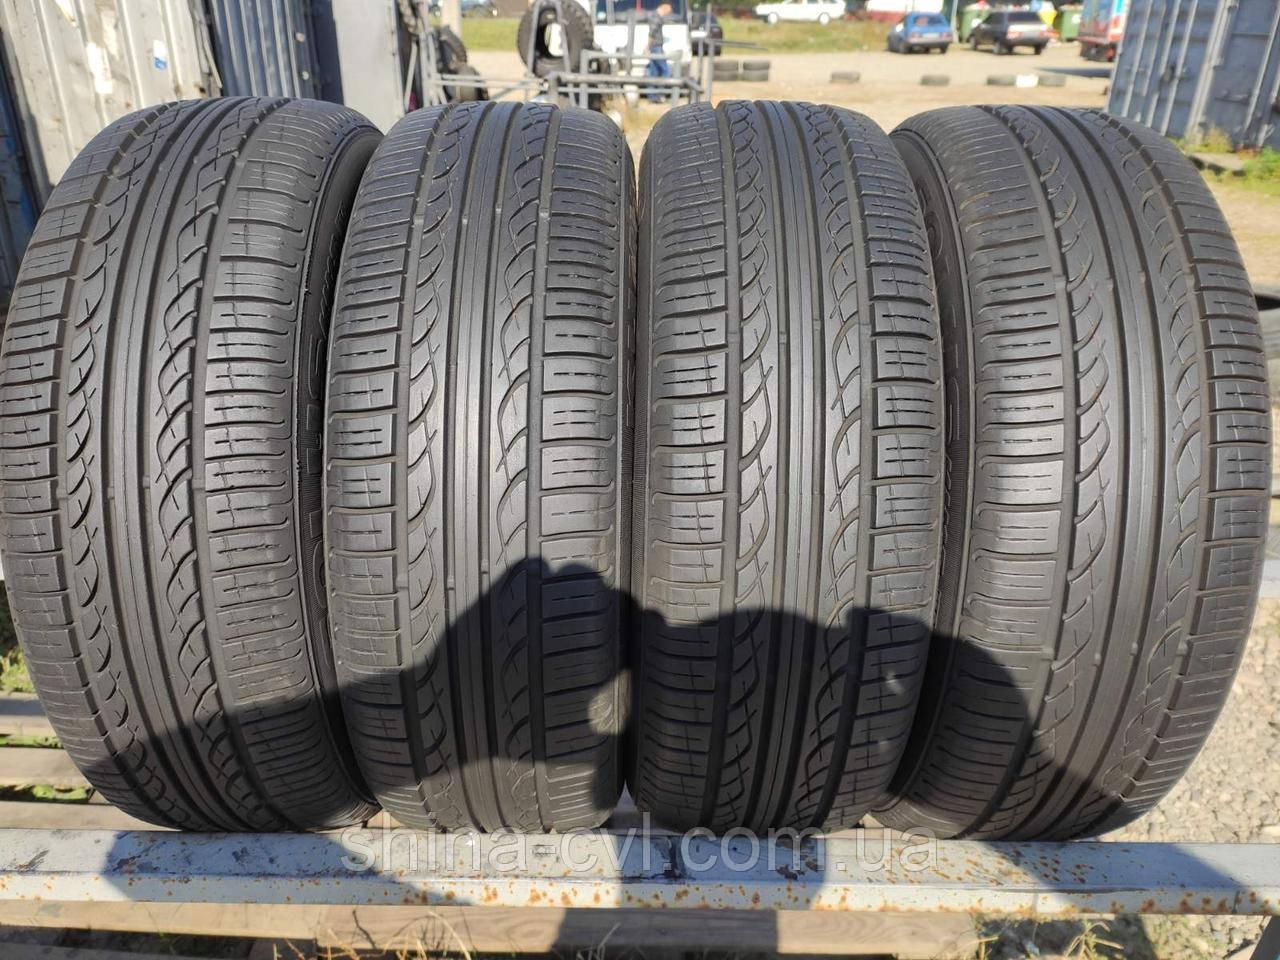 Літні шини 185/65 R15 88T KUMHO SOLUS KH15